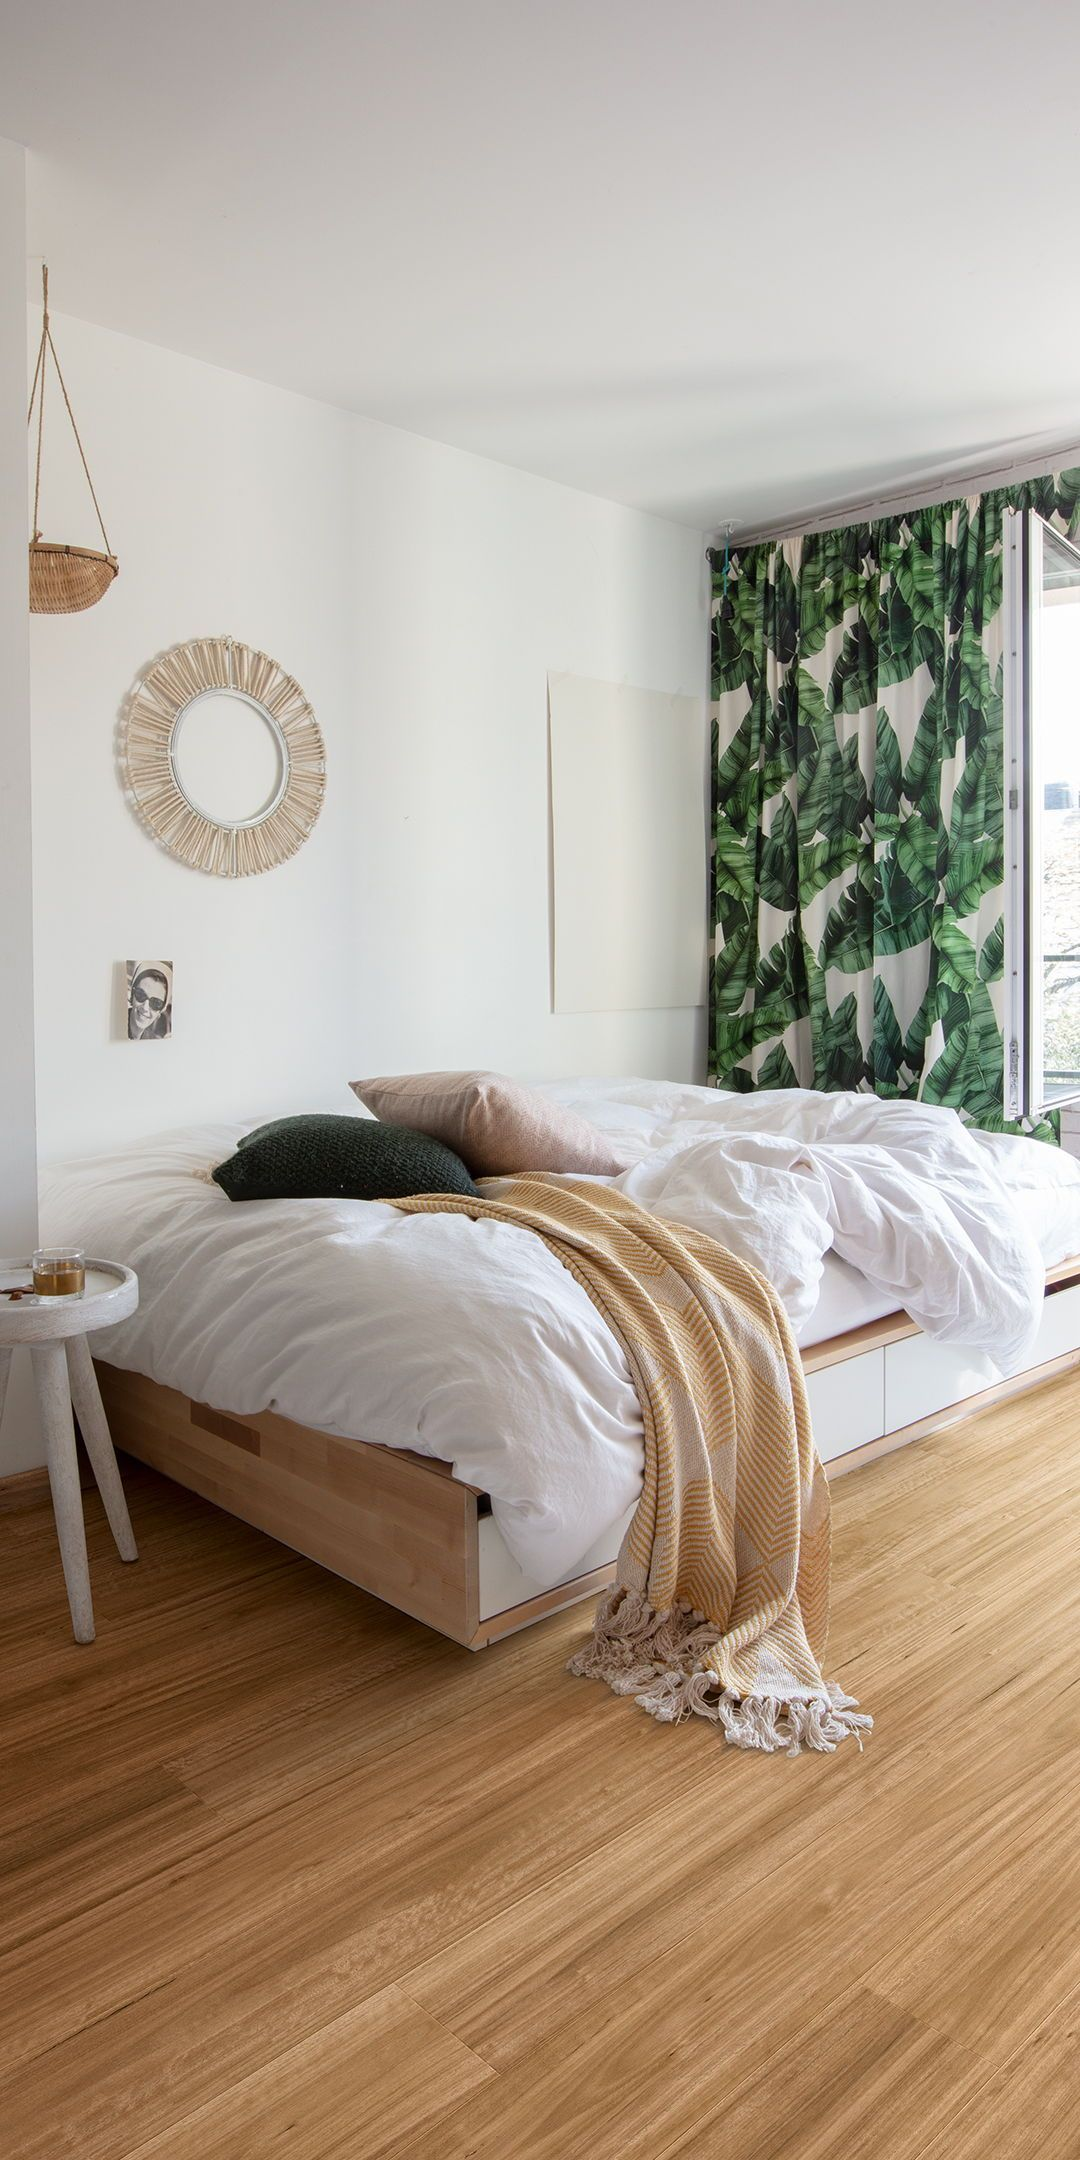 95 Bedroom Flooring Inspiration Ideas In 2021 Bedroom Flooring Flooring Inspiration Perfect Bedroom